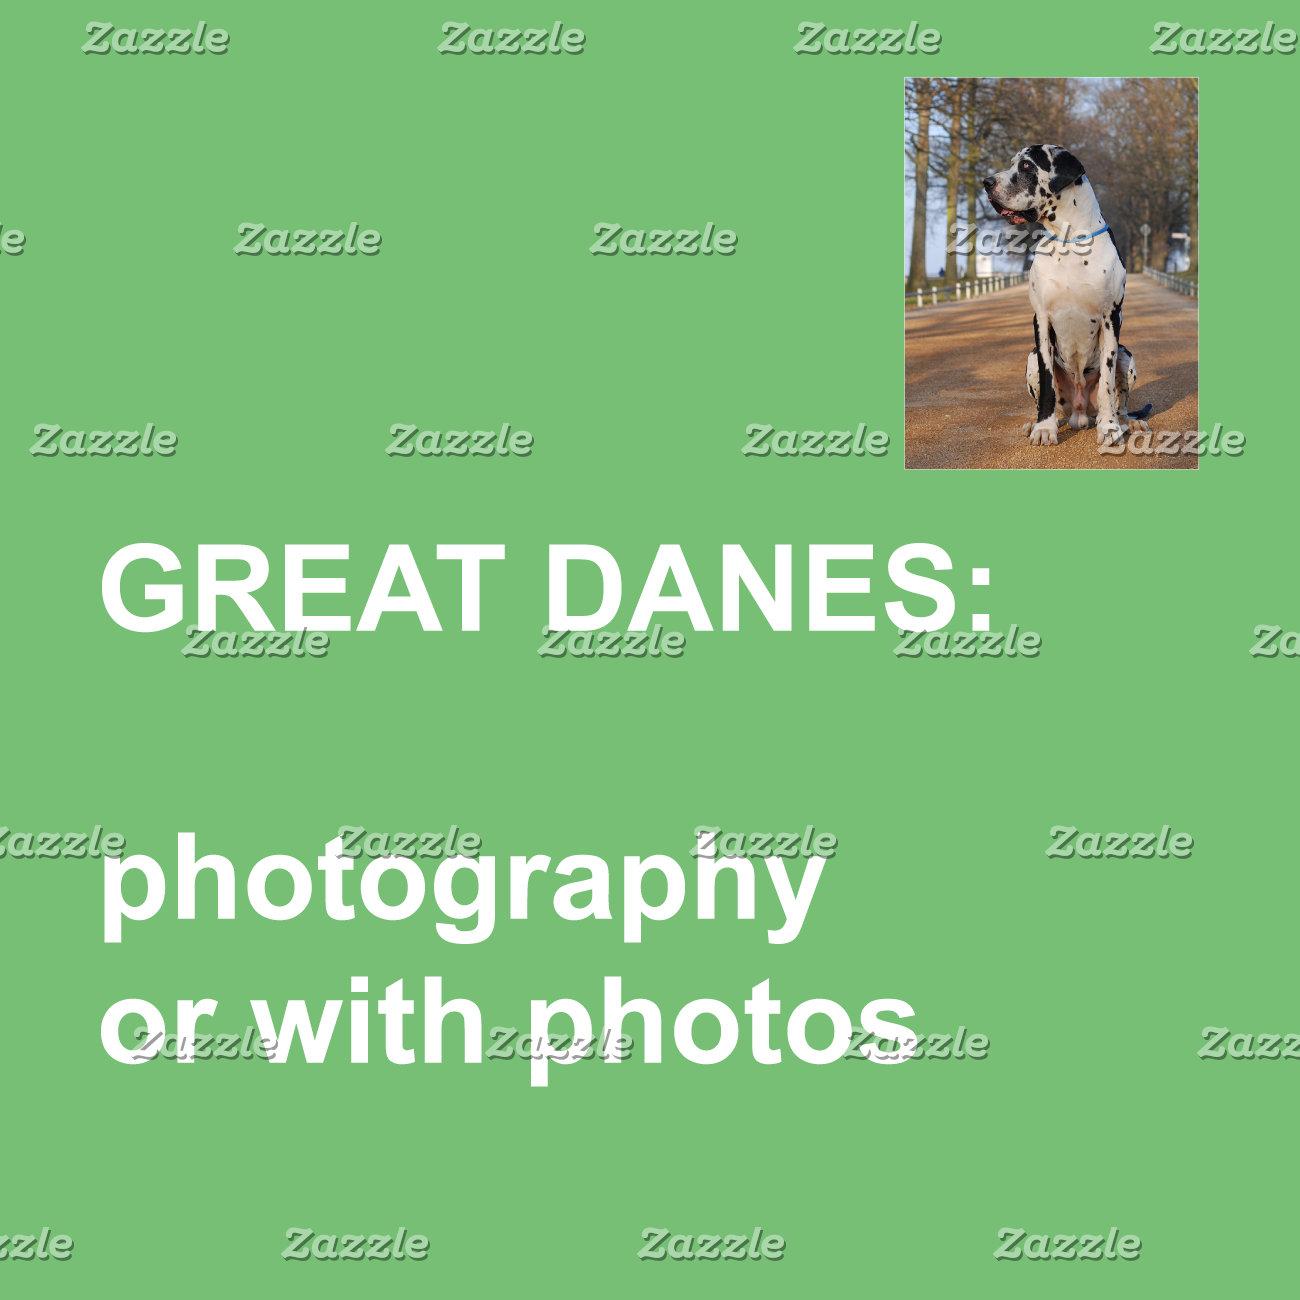 GD photography